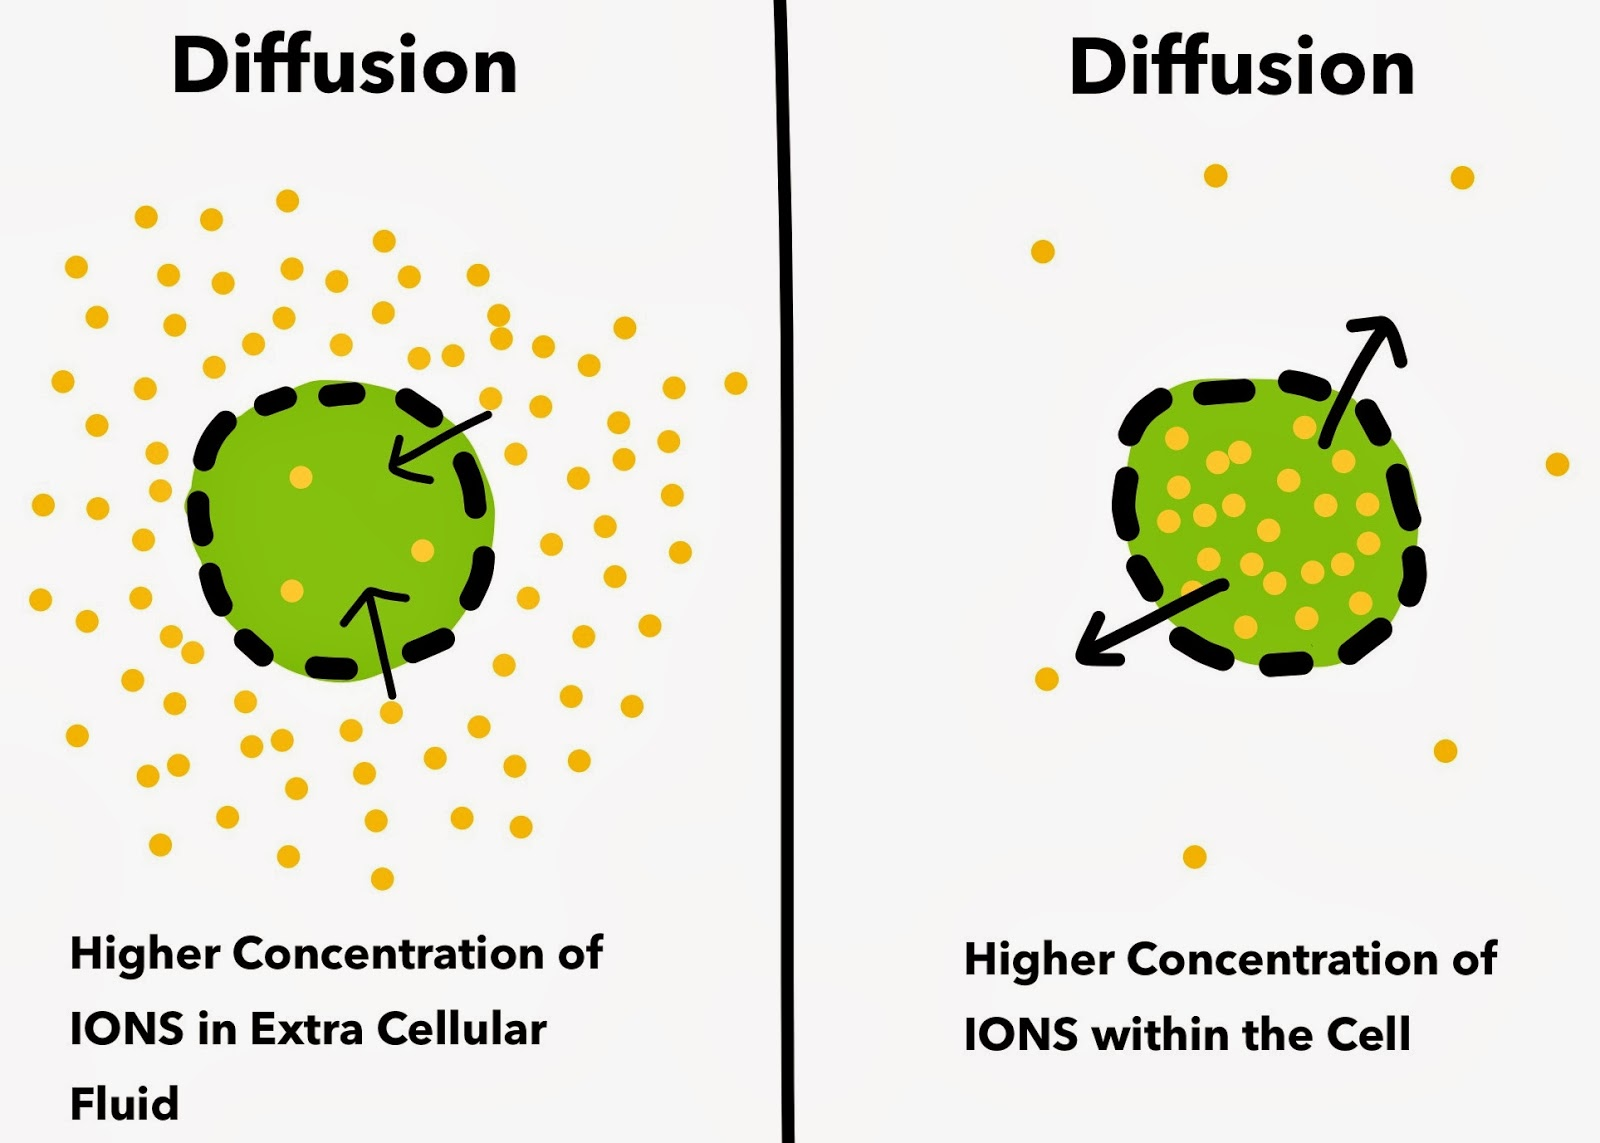 Diffusion Heart Cell Membrane Potential